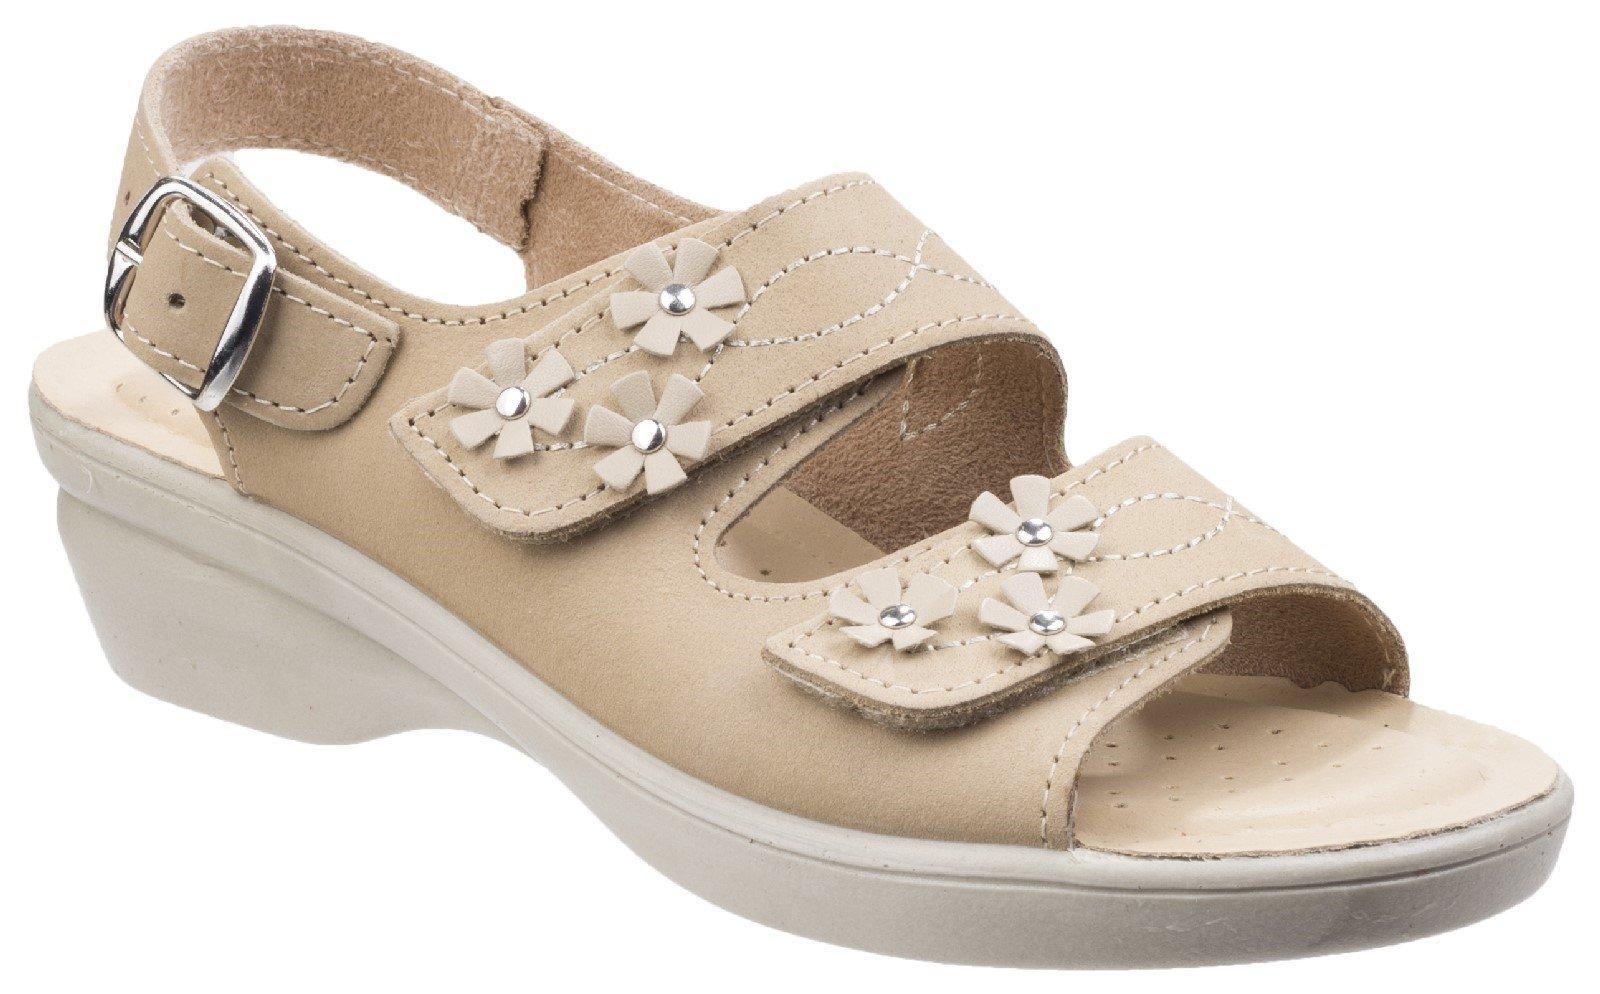 Fleet & Foster Women's Amaretto Touch Fastening Sandal Various Colours 26298 - Beige 3